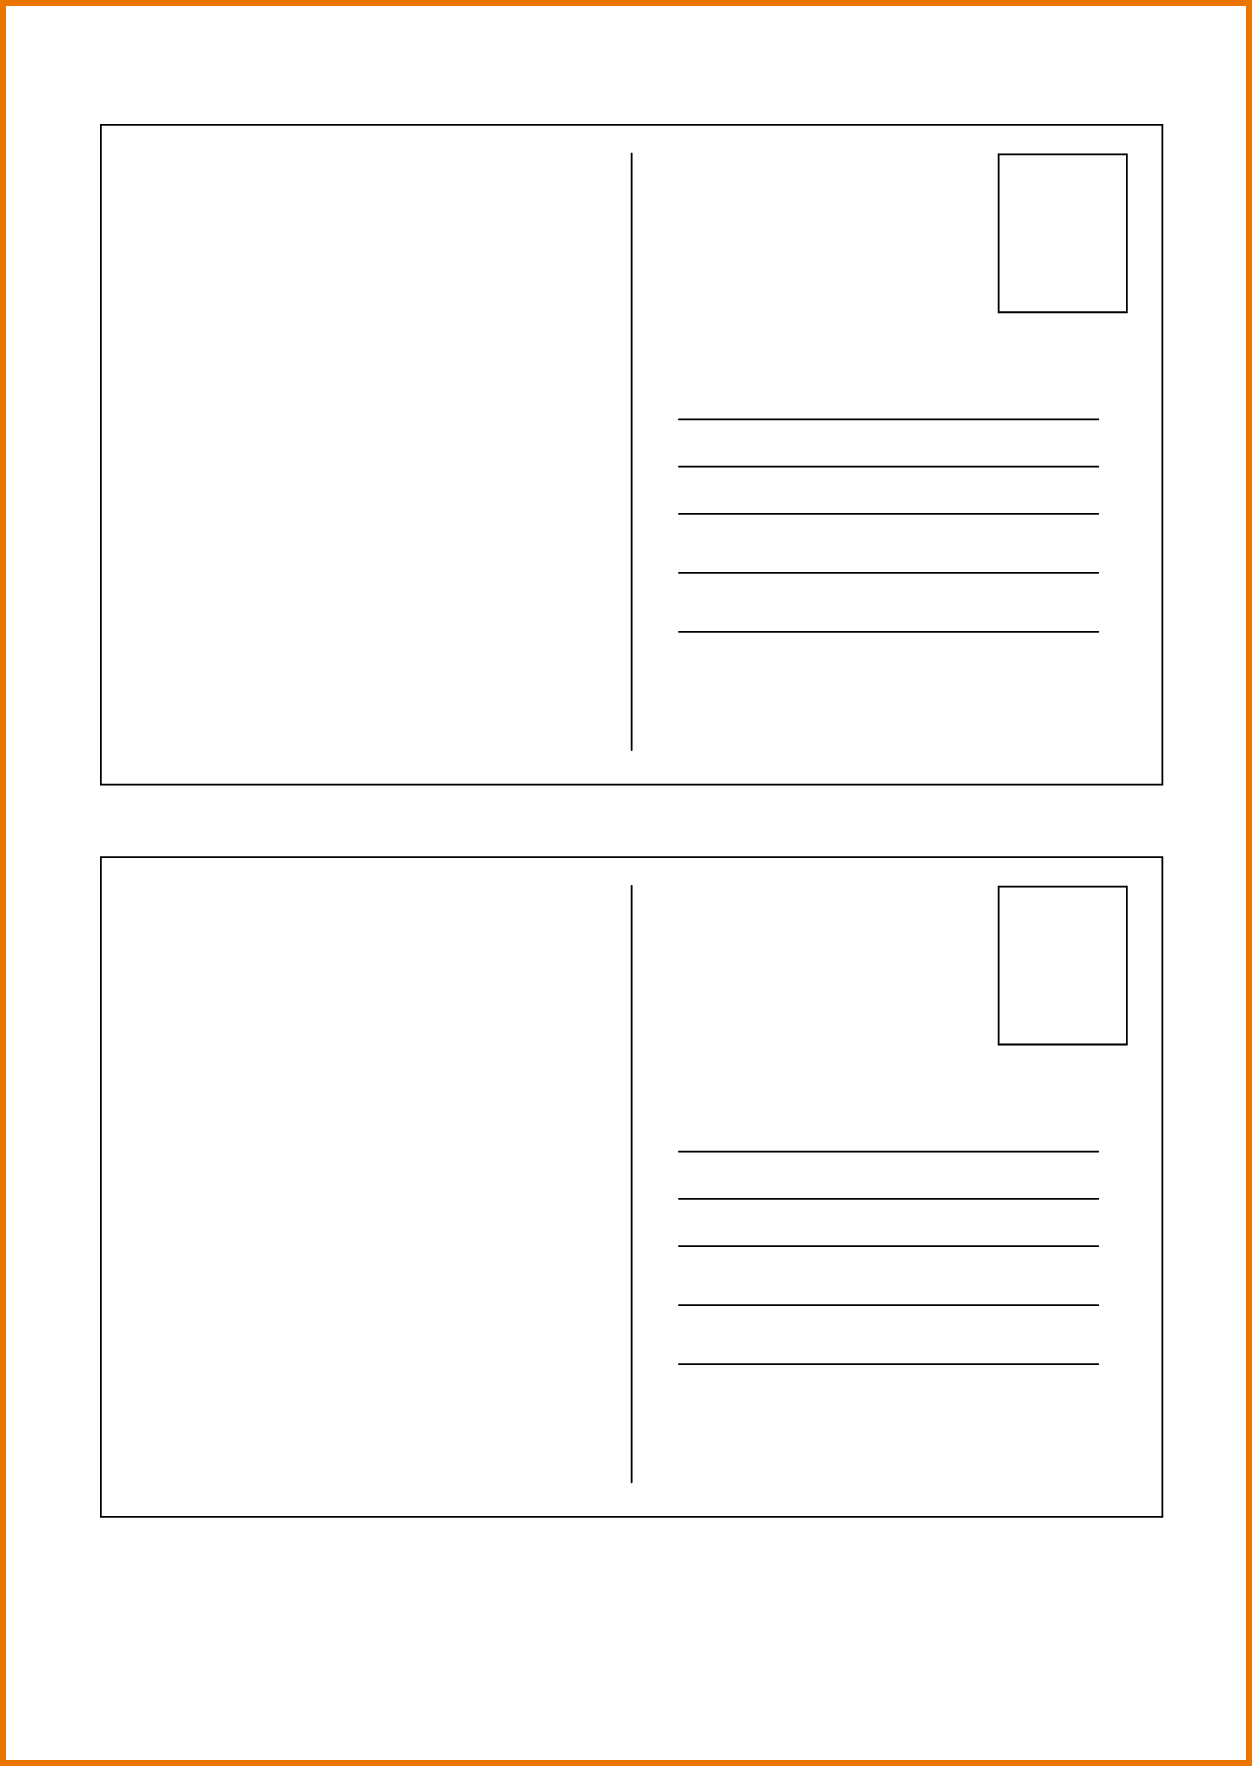 Postcard Template Postcard Printing Postcard Template Postcard - Free Blank Printable Postcards